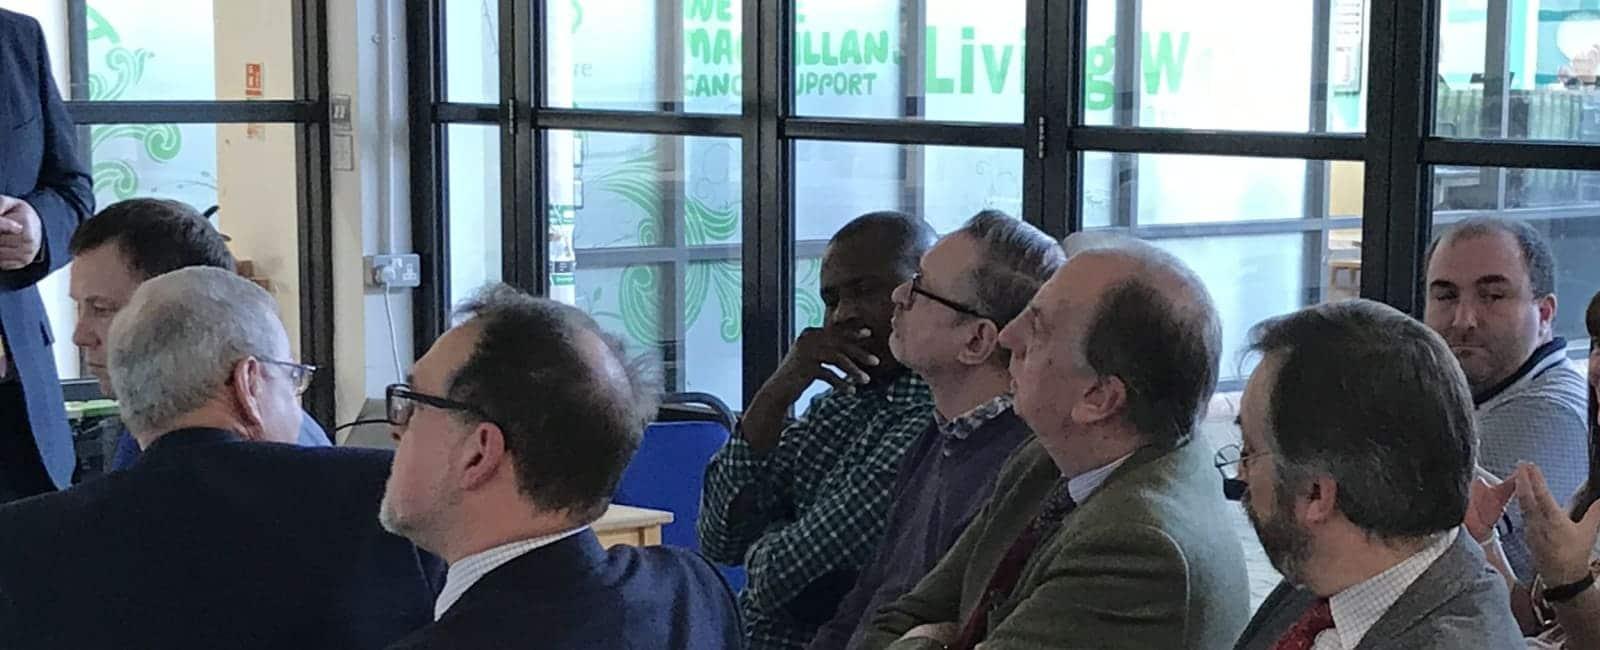 Paisley Funding Spotlight Session